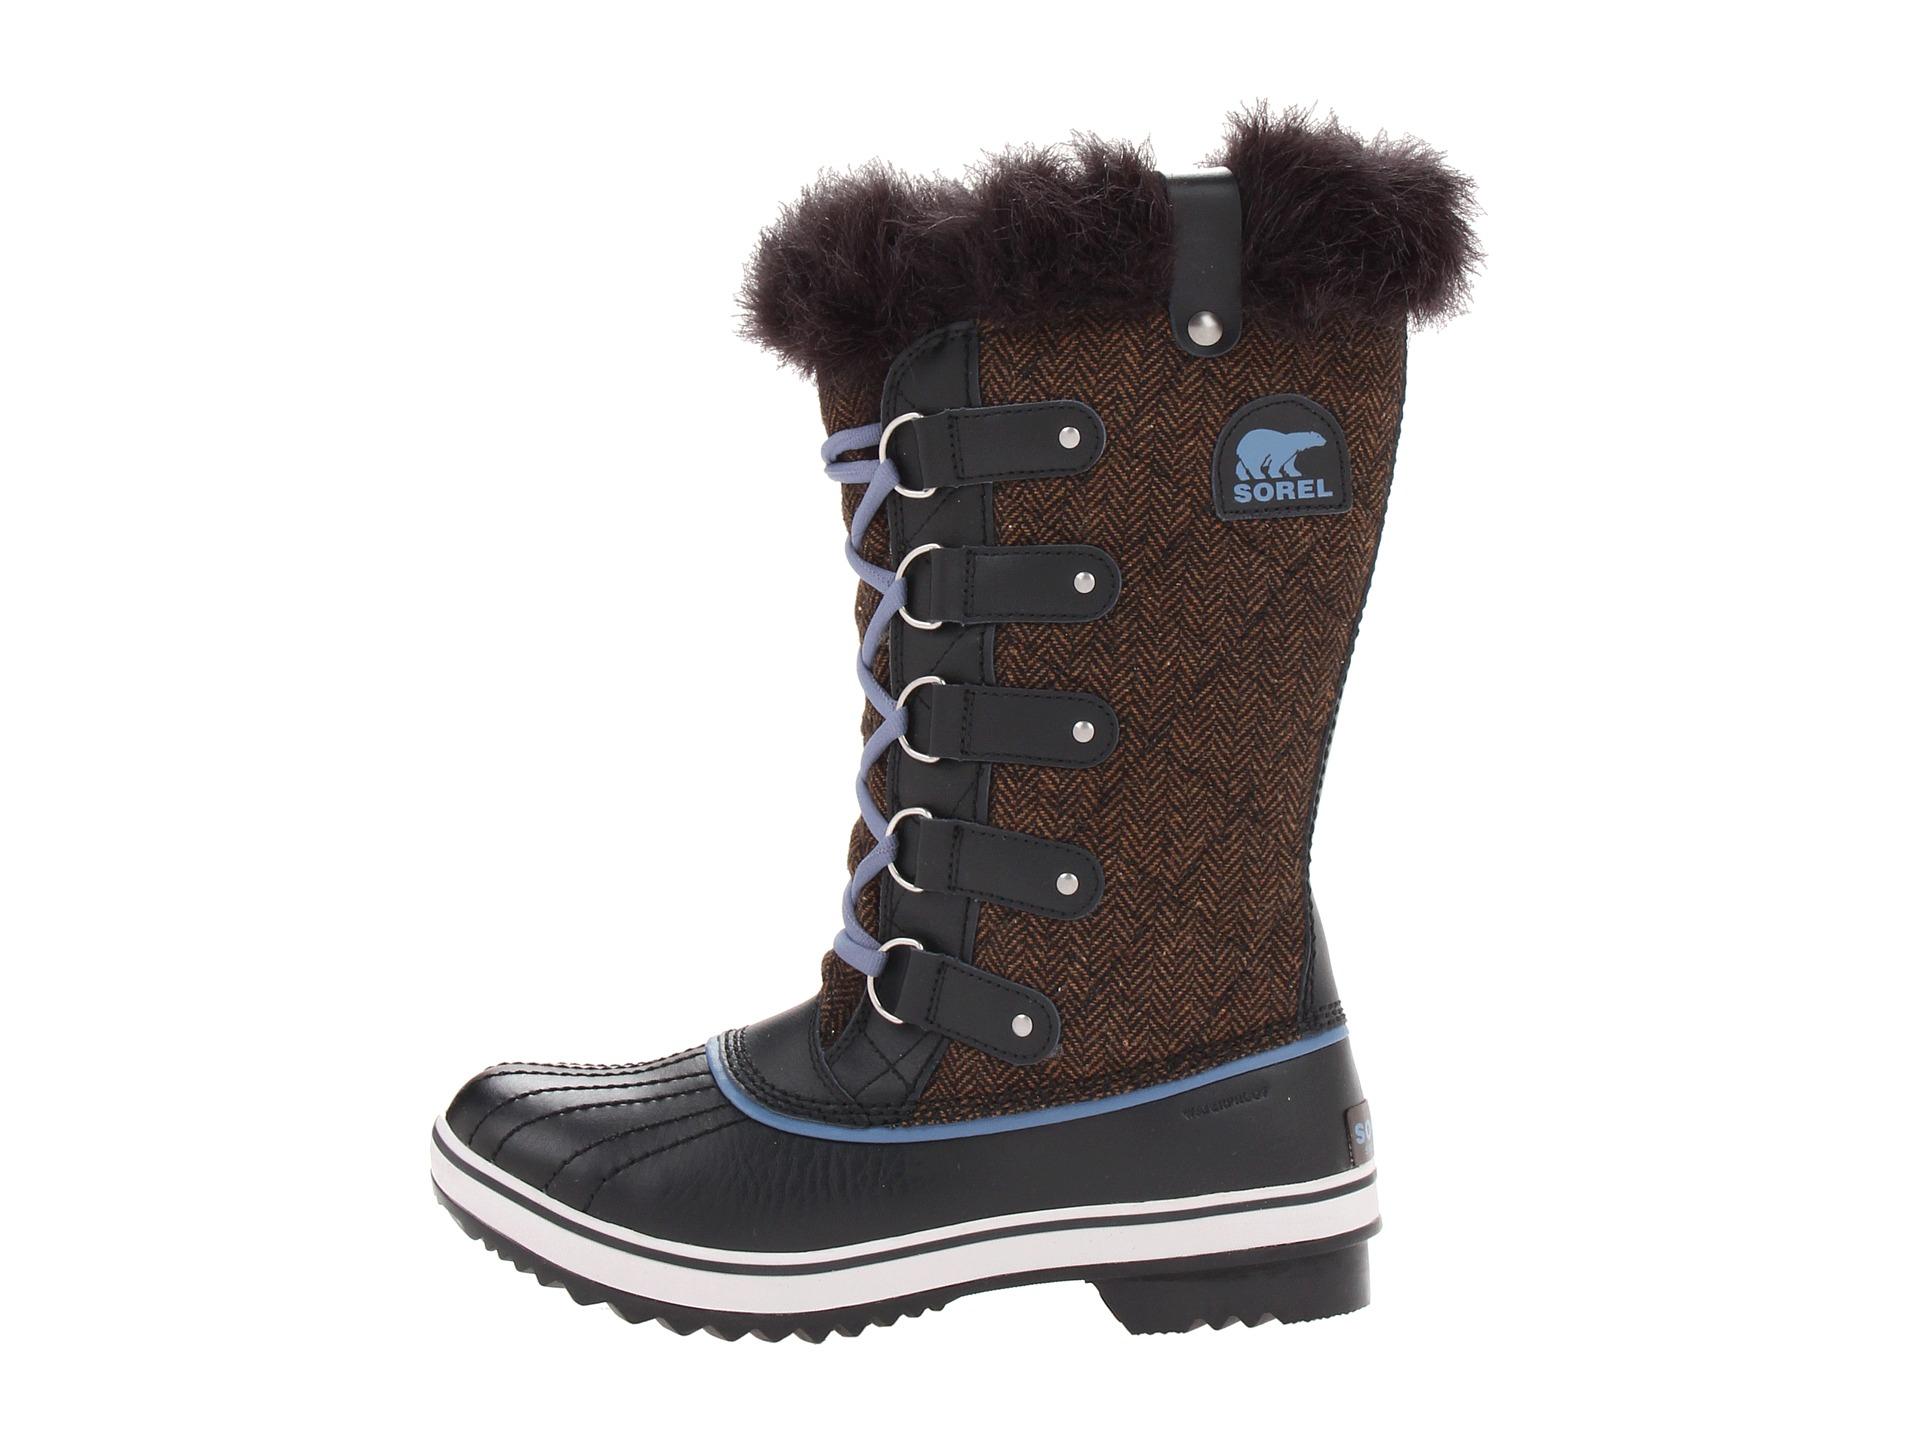 Sorel Tofino Herringbone Water Resistant Boots In Brown Lyst